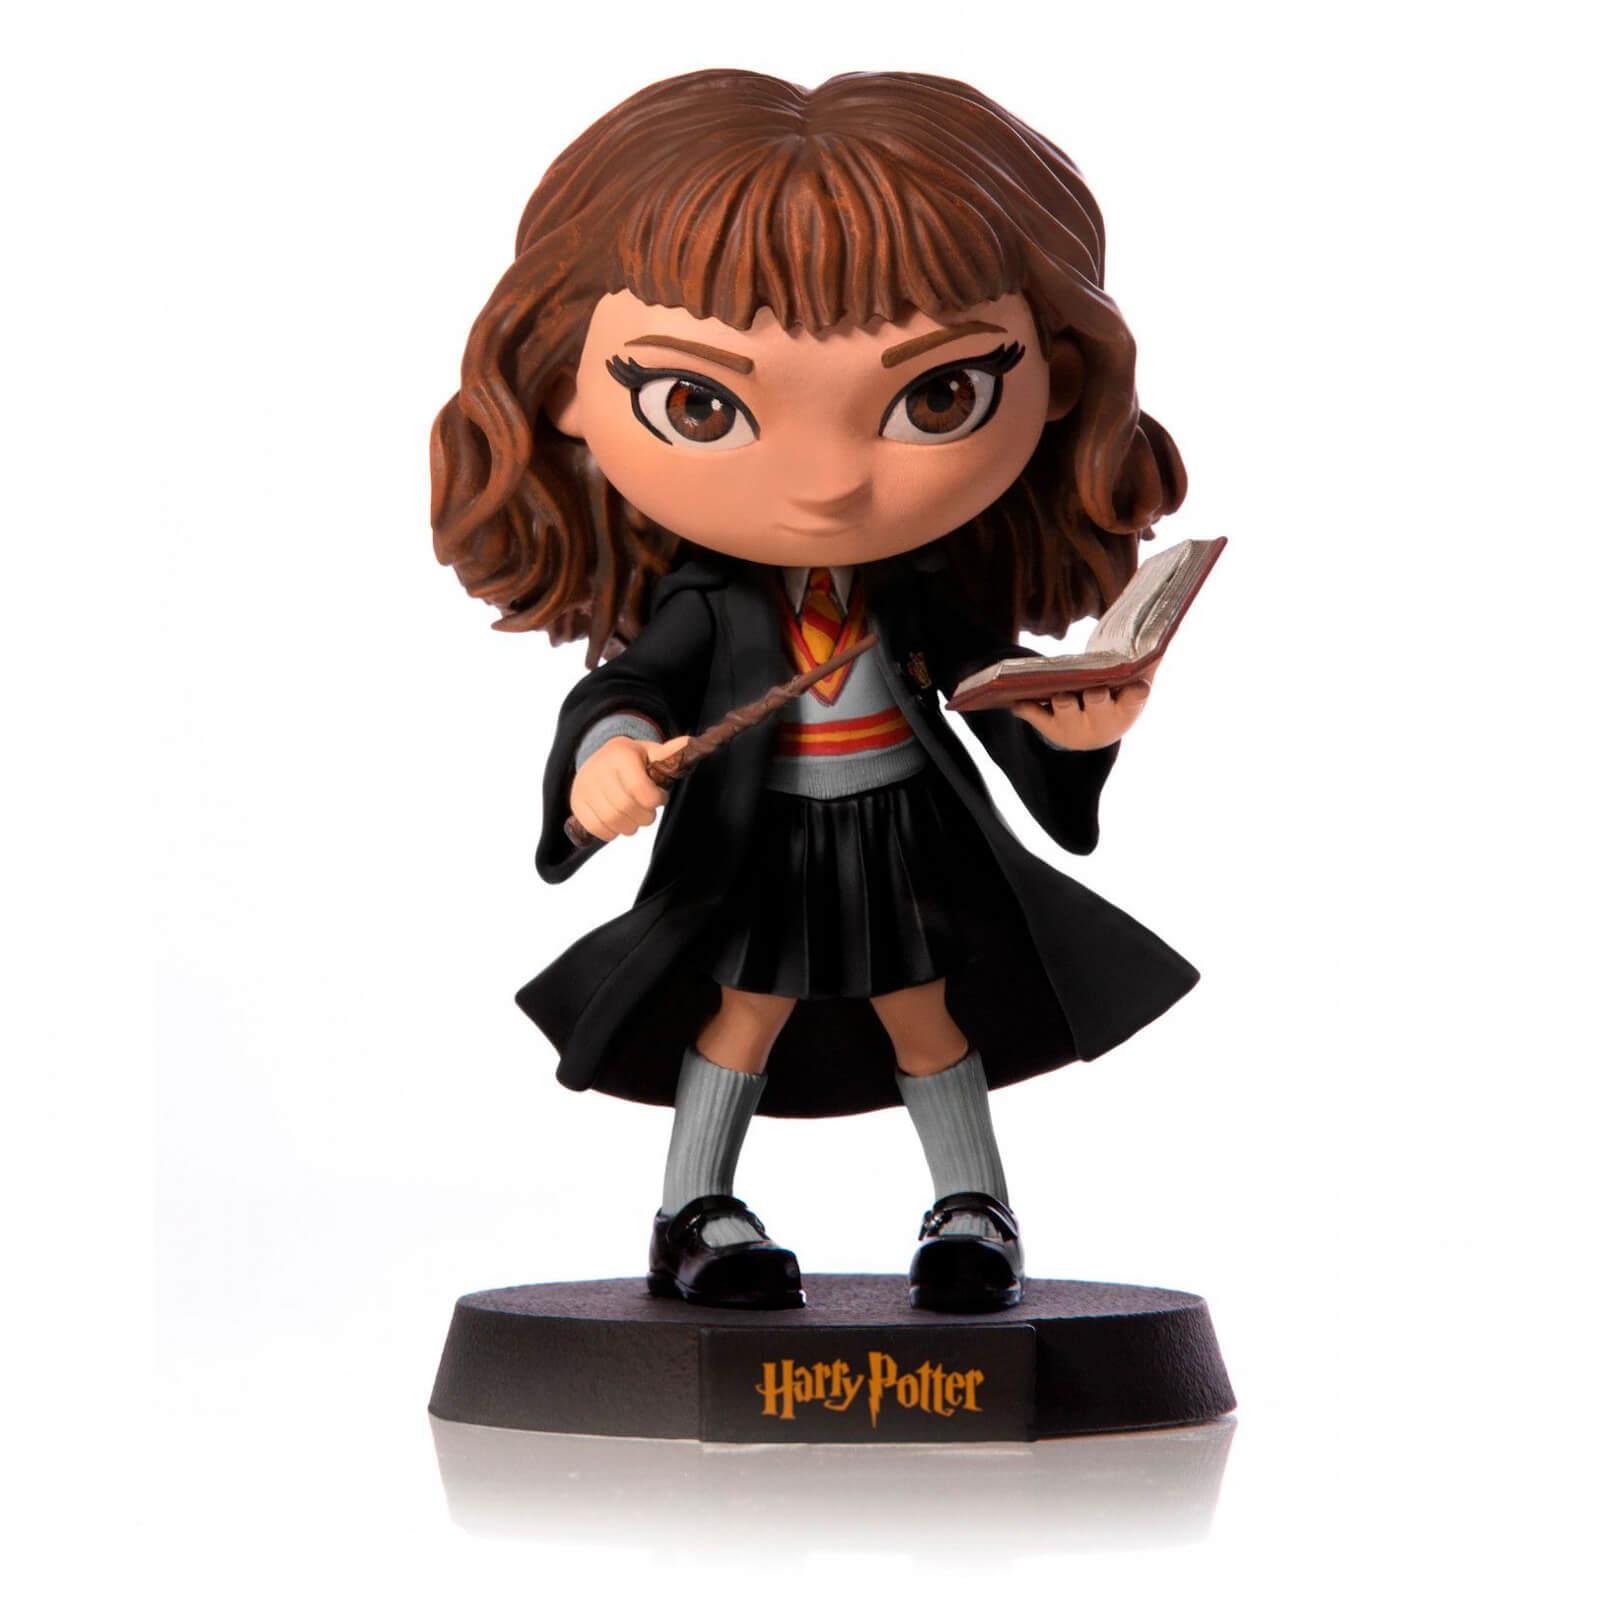 Image of Iron Studios Harry Potter Mini Co. PVC Figure Hermione 12 cm